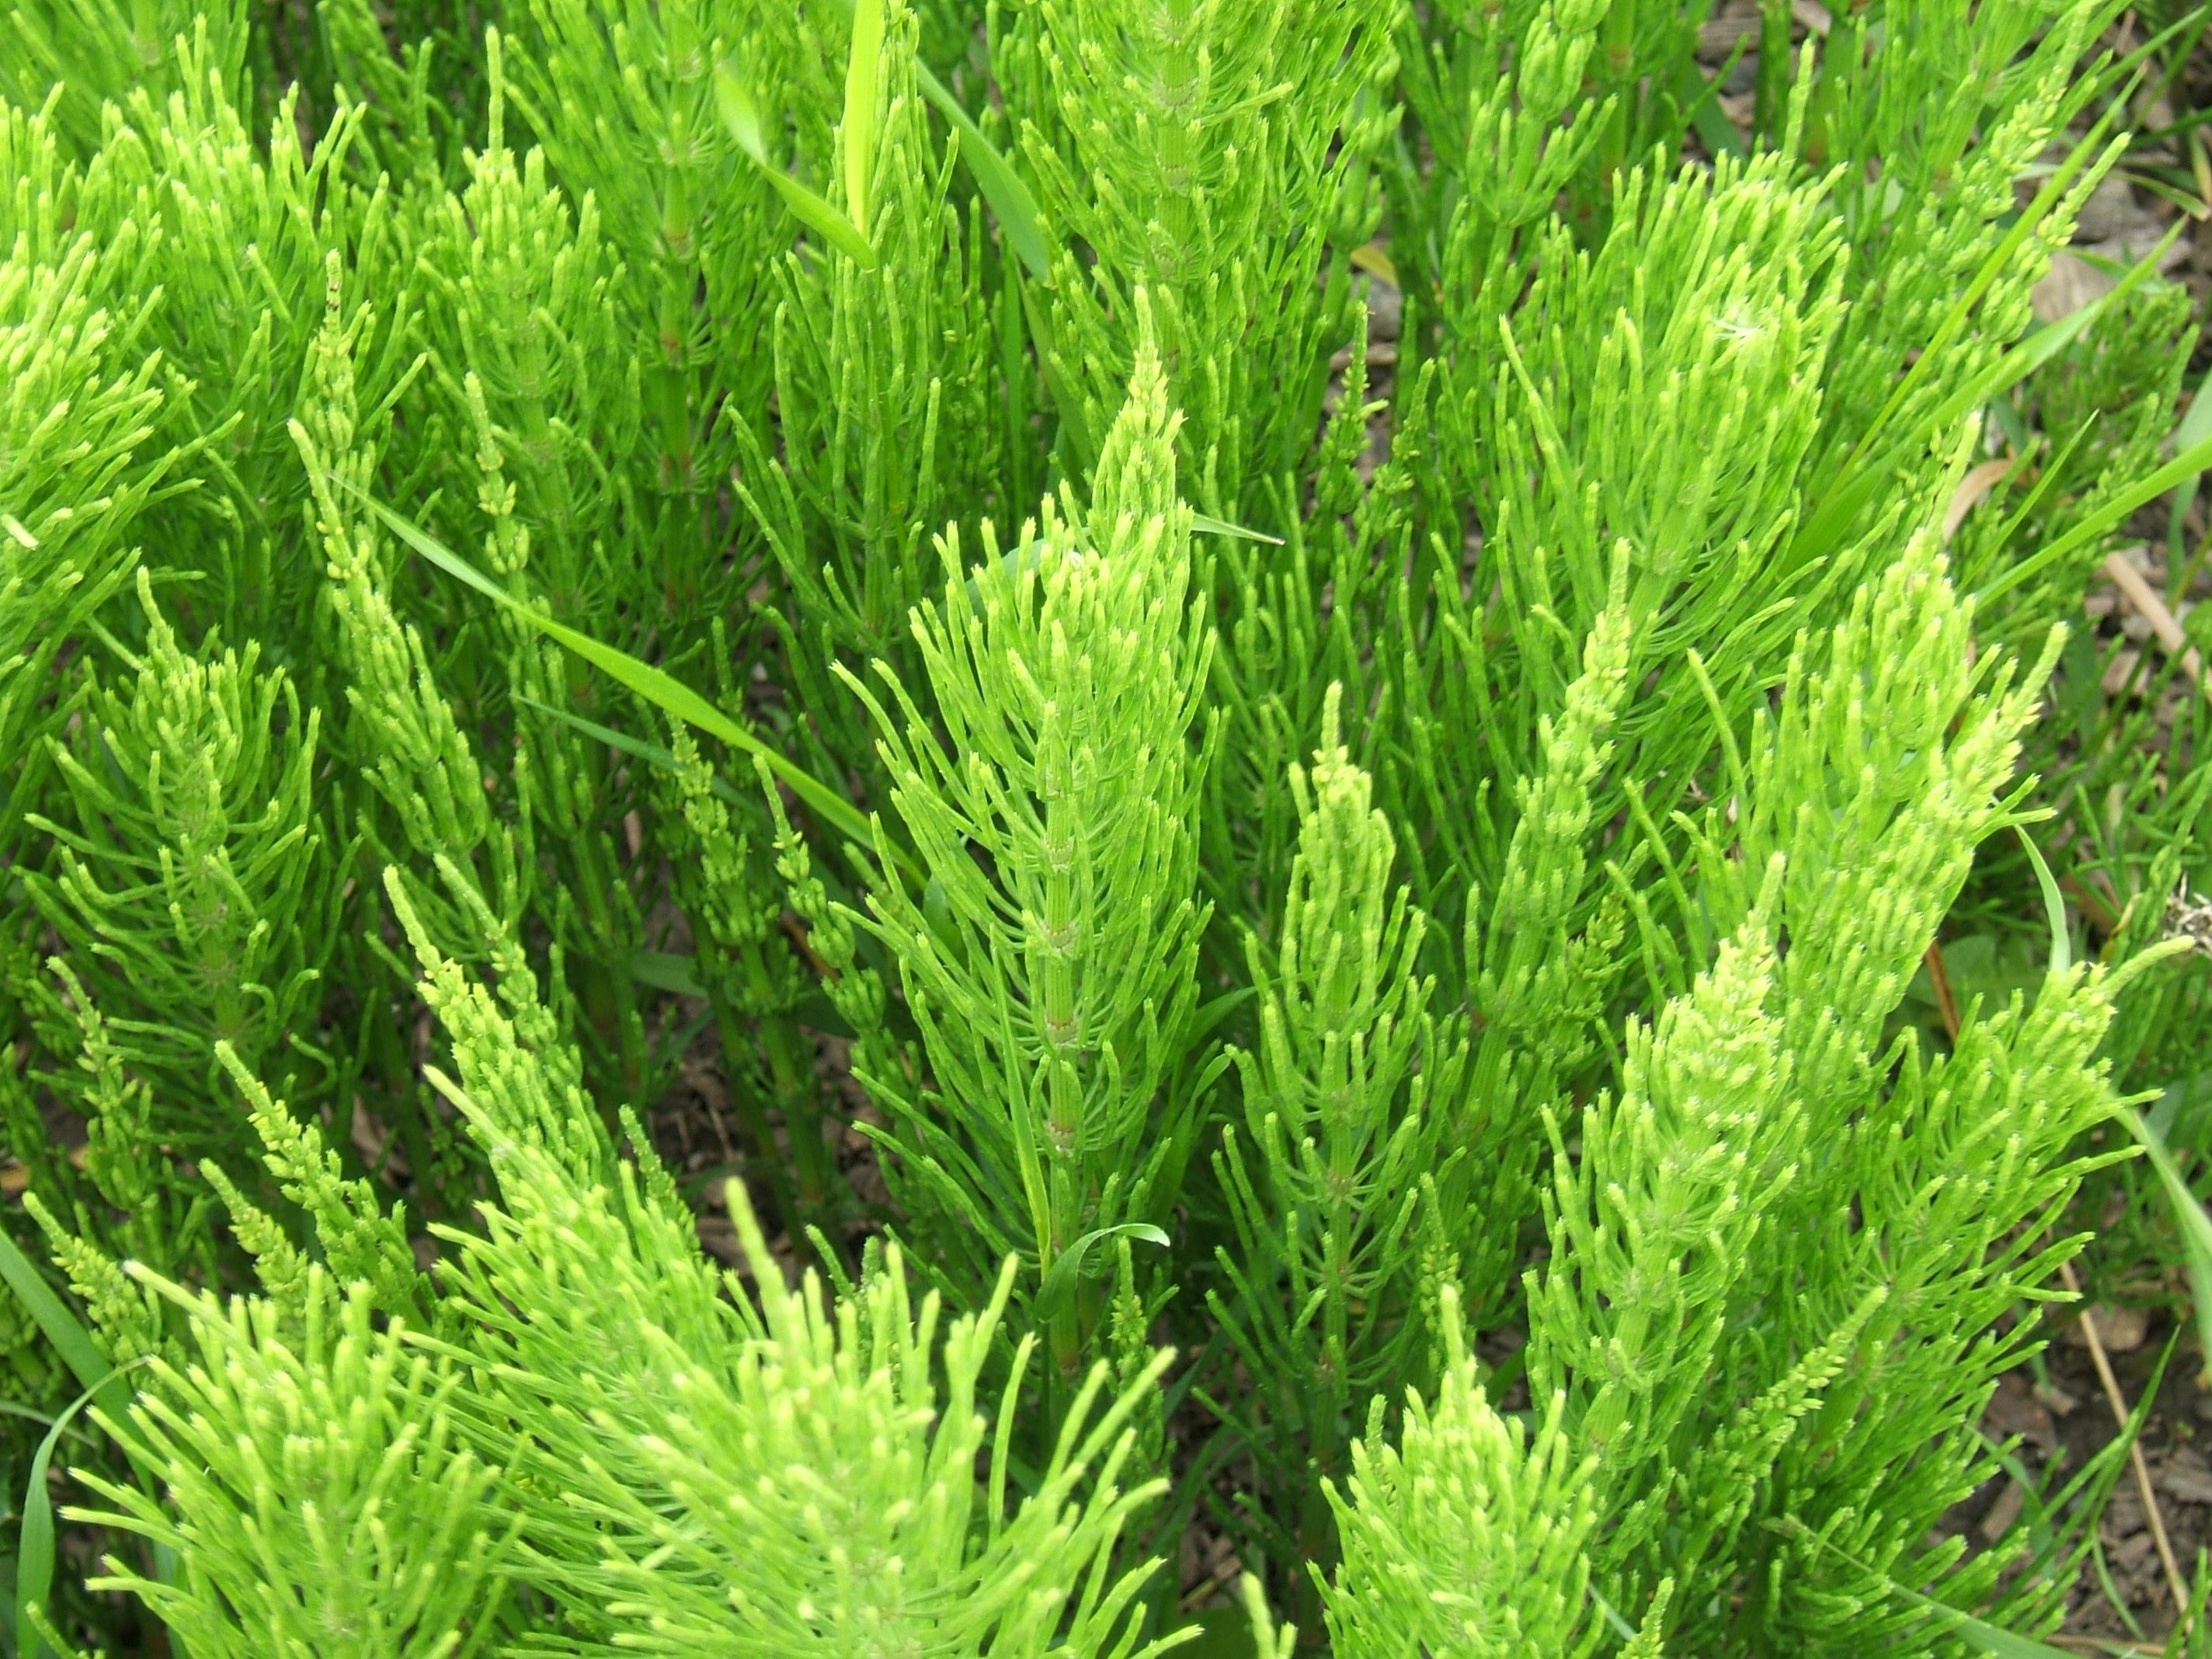 Heermoes (Equisetum arvense) | De Kruidenwereld